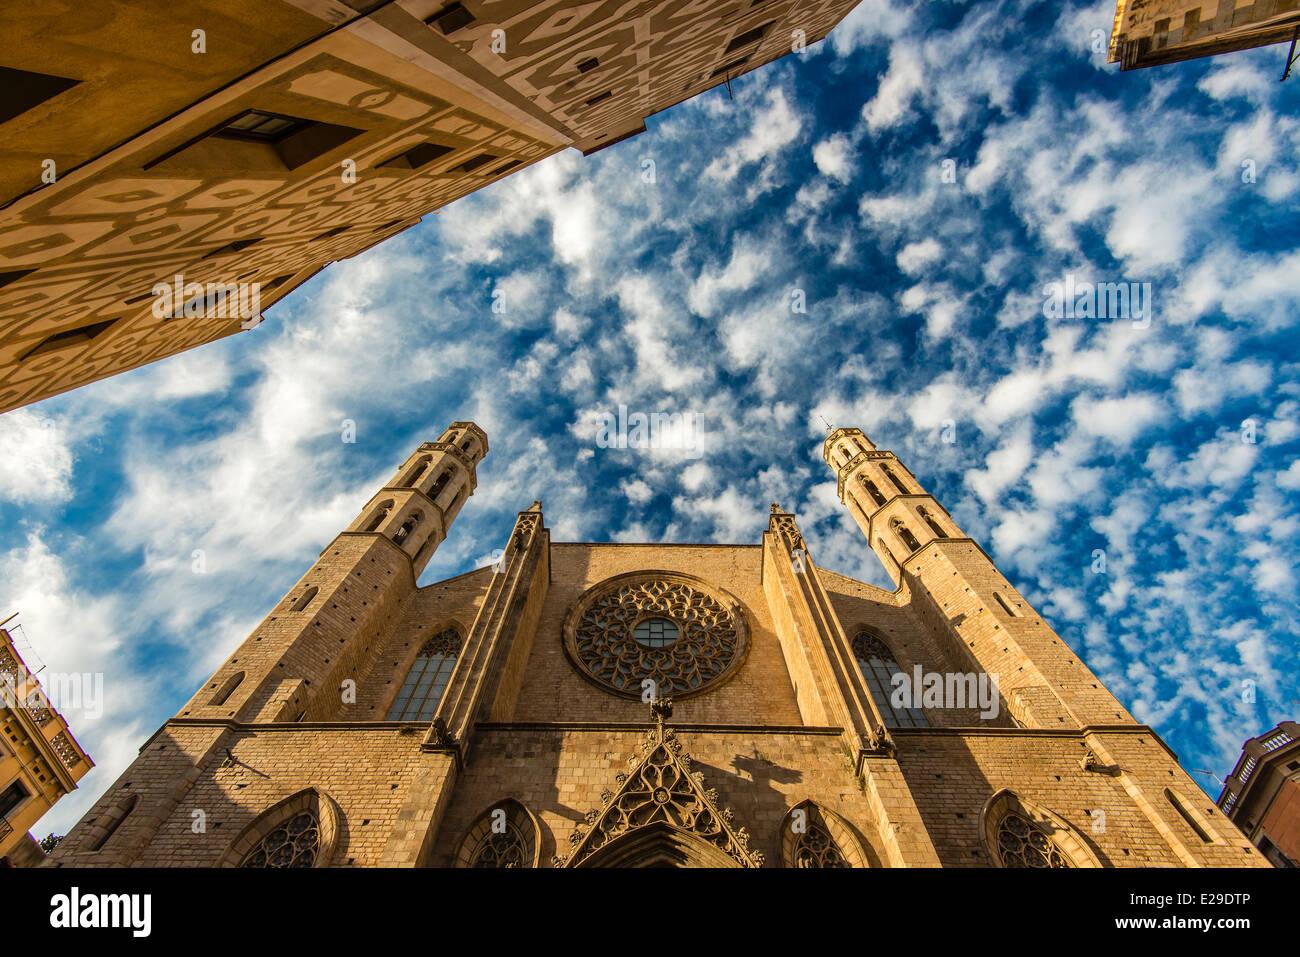 Fassade von Santa Maria del Mar Kirche, Born Viertel, Barcelona, Katalonien, Spanien Stockbild